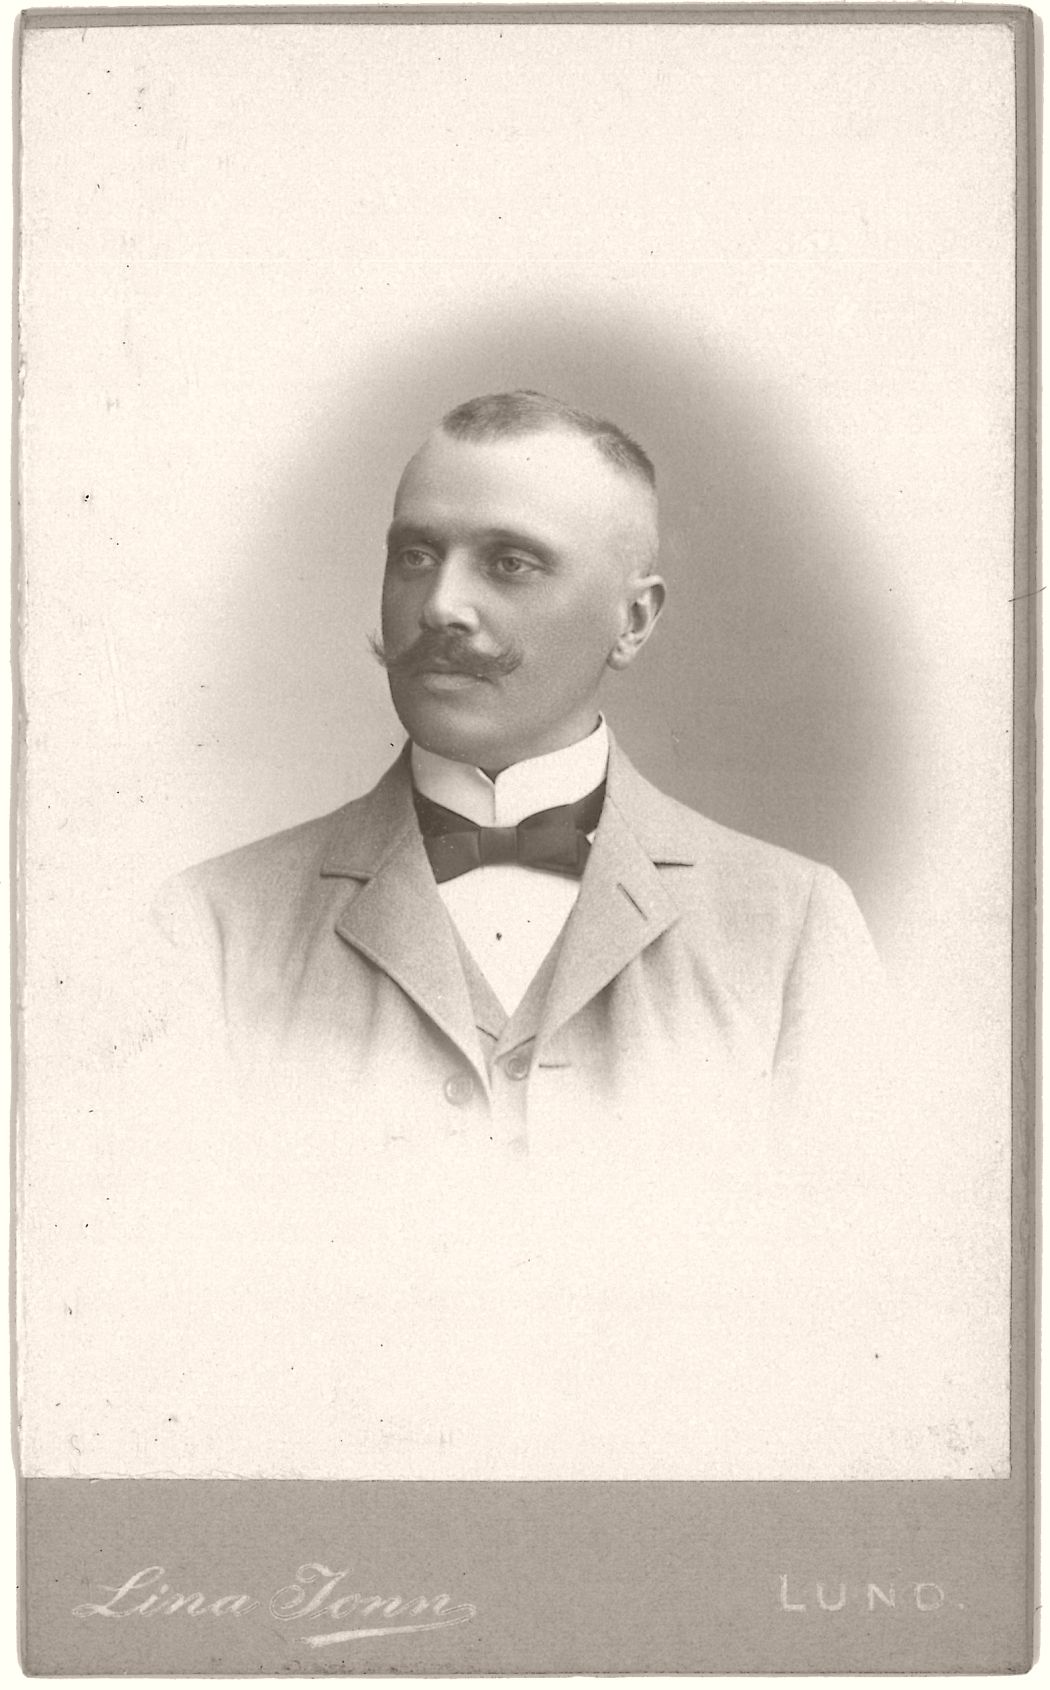 Ernst A. Kallenberg (1866-1947), Swedish jurist and professor at Lund University.